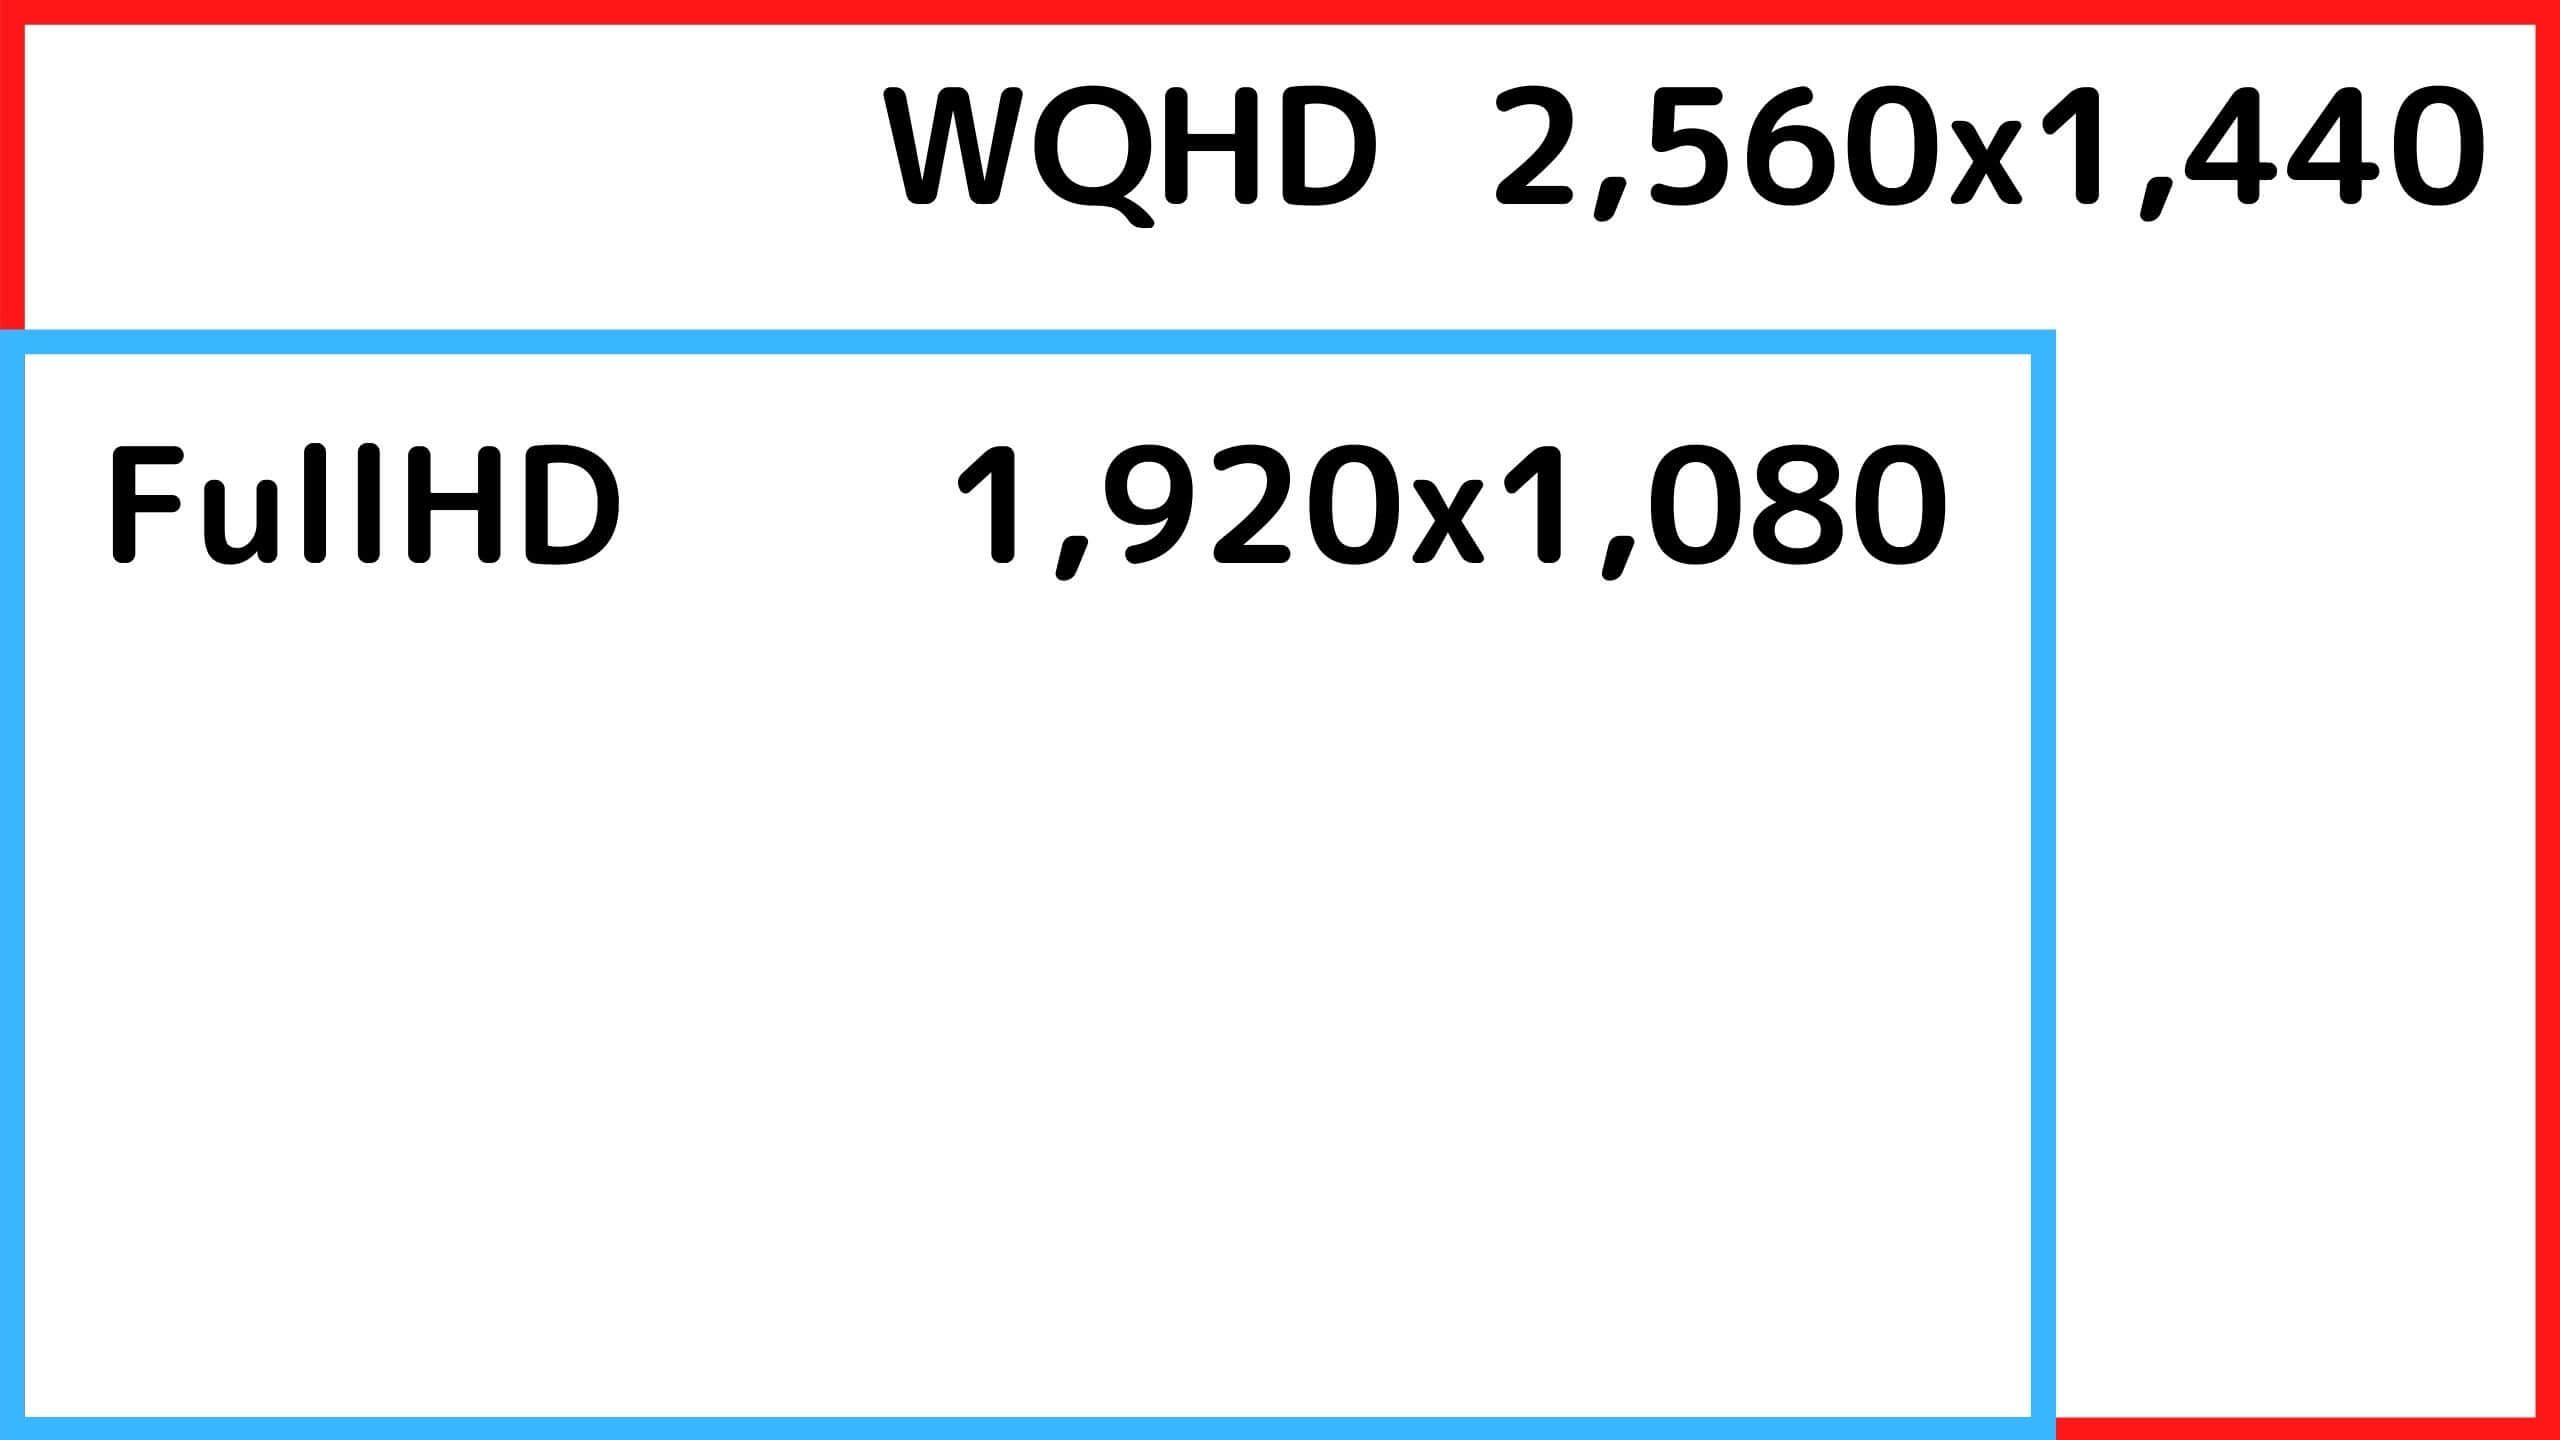 WQHDとFullHDの大きさの違い